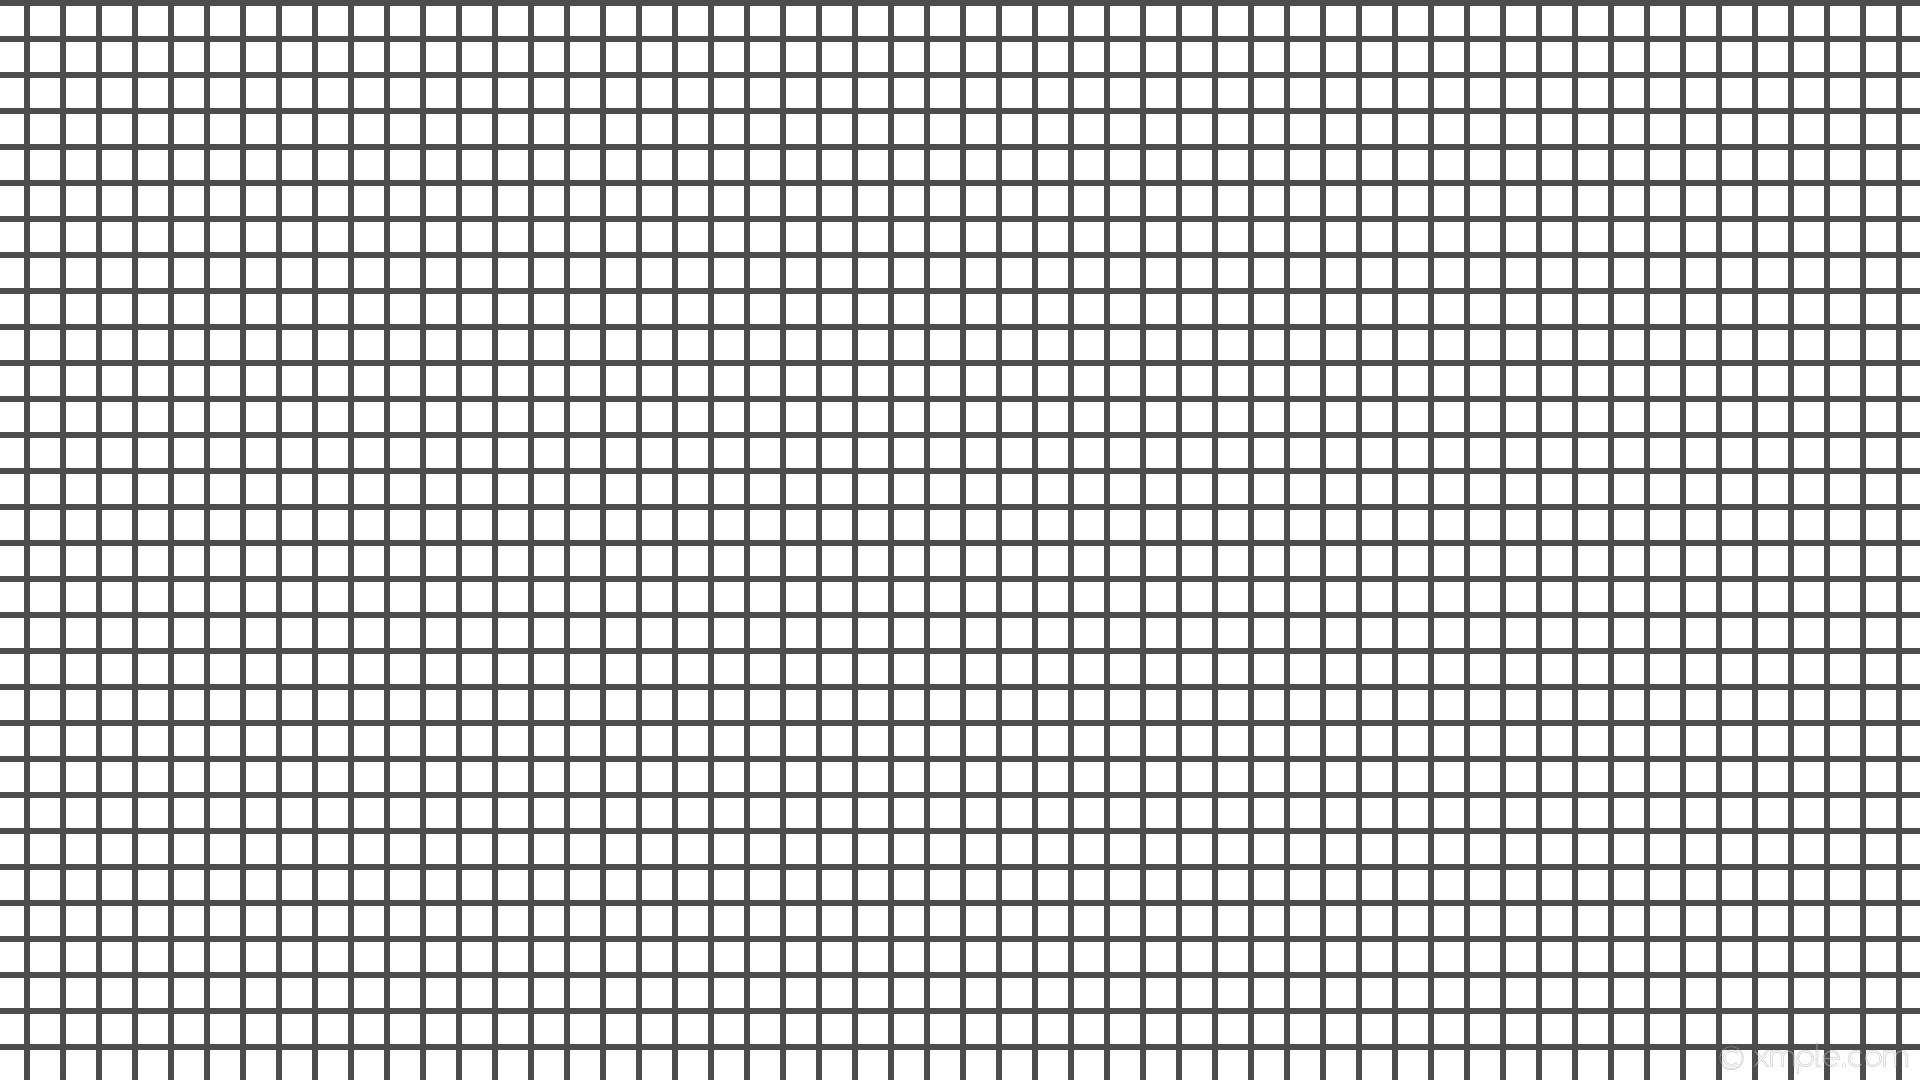 5ea57056900e8 1920x1080 wallpaper graph paper black white grid #ffffff #000000 0° 6px  36px